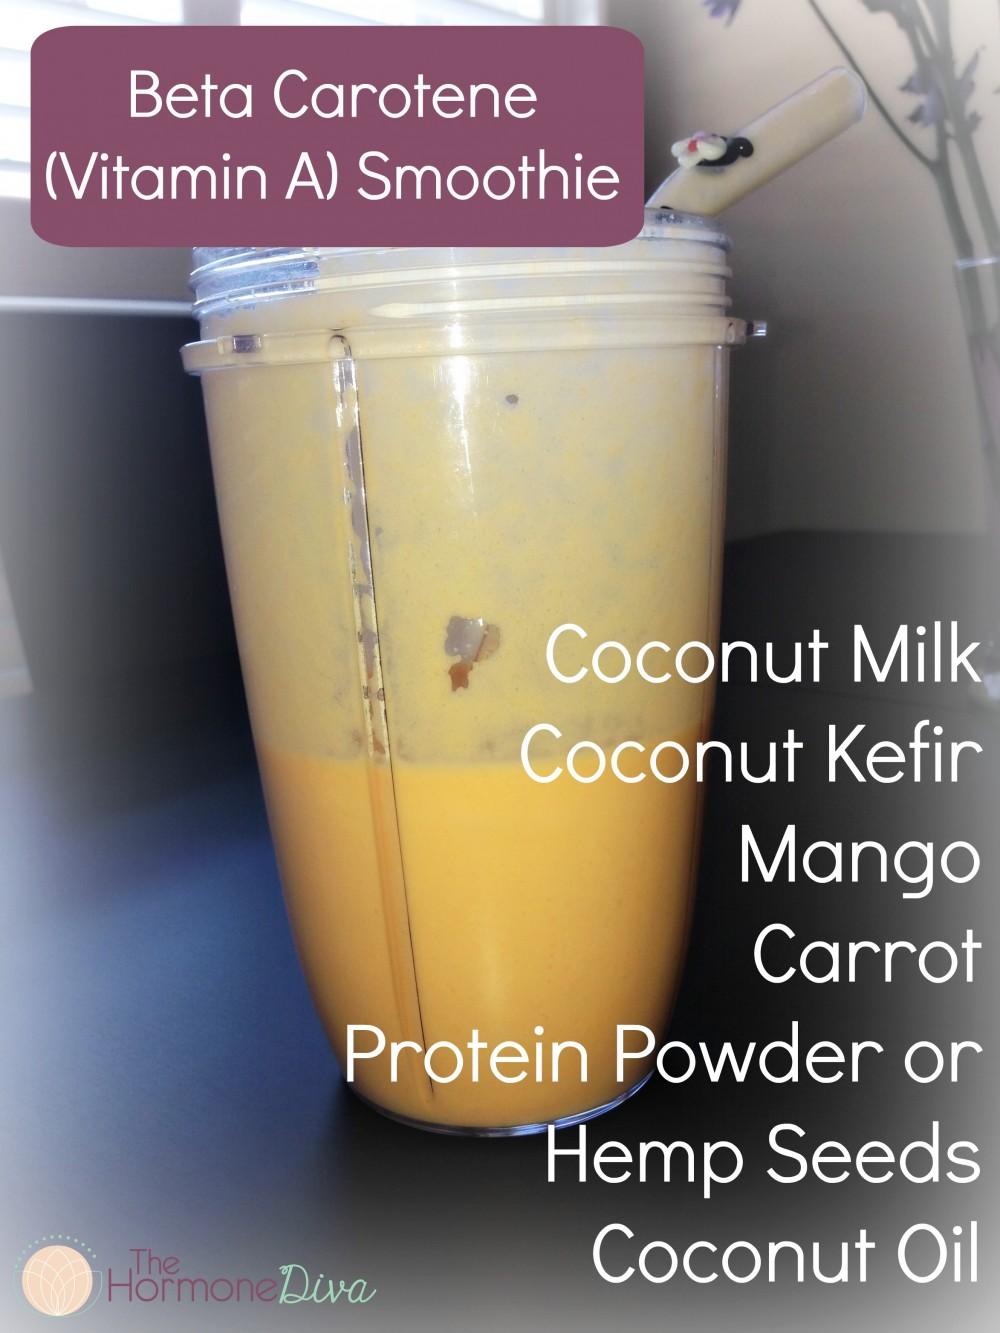 Vitamin A Smoothie